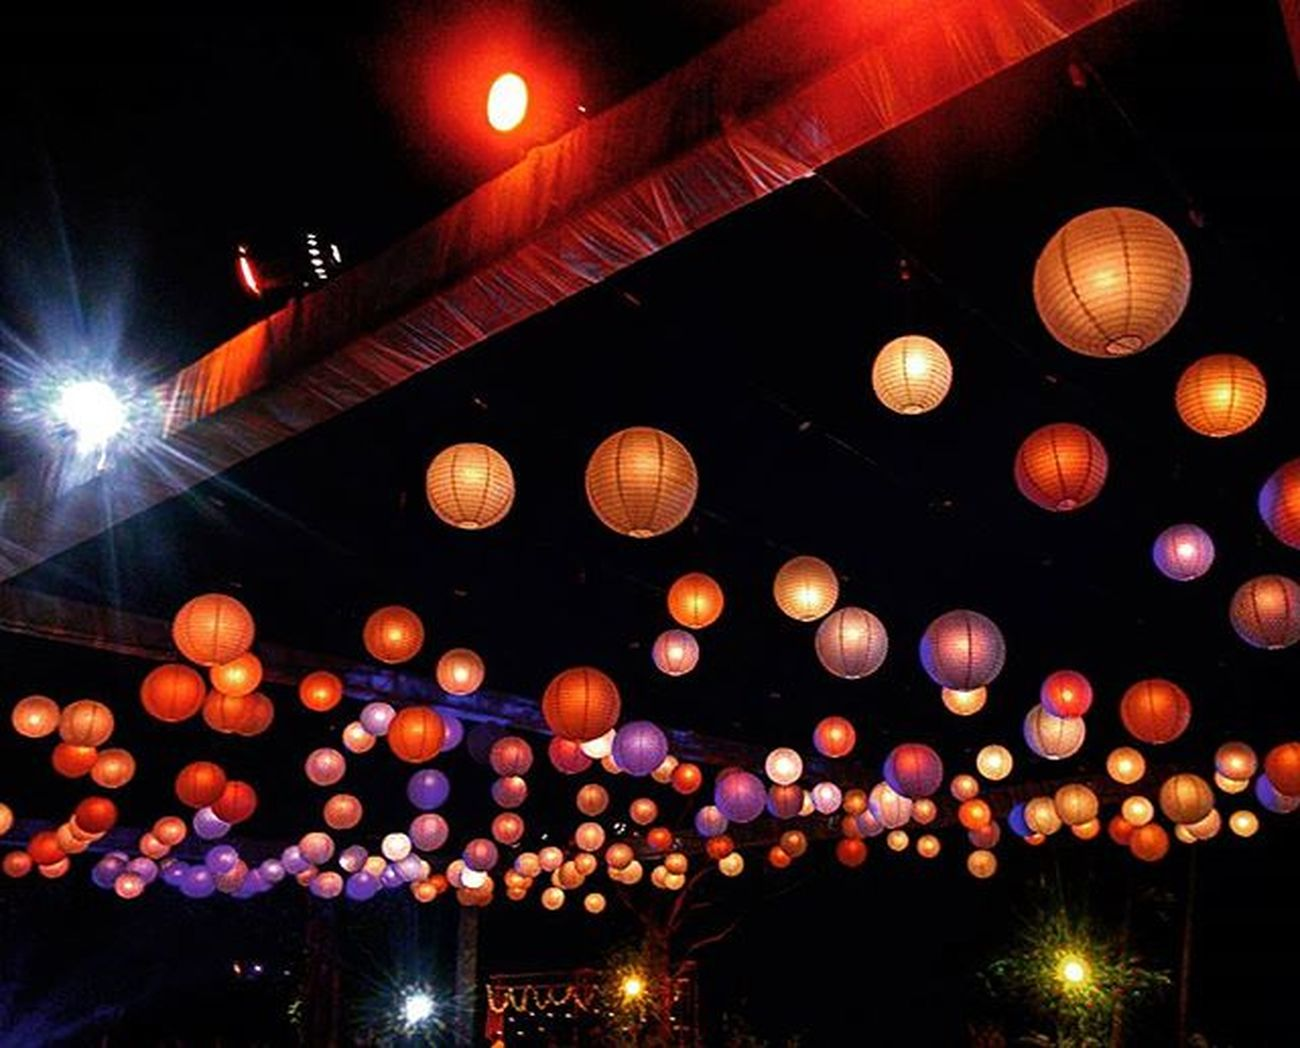 Aeshkydiwedding Gagans_photography Picsagram Instachandigarh Goa Love Ambience